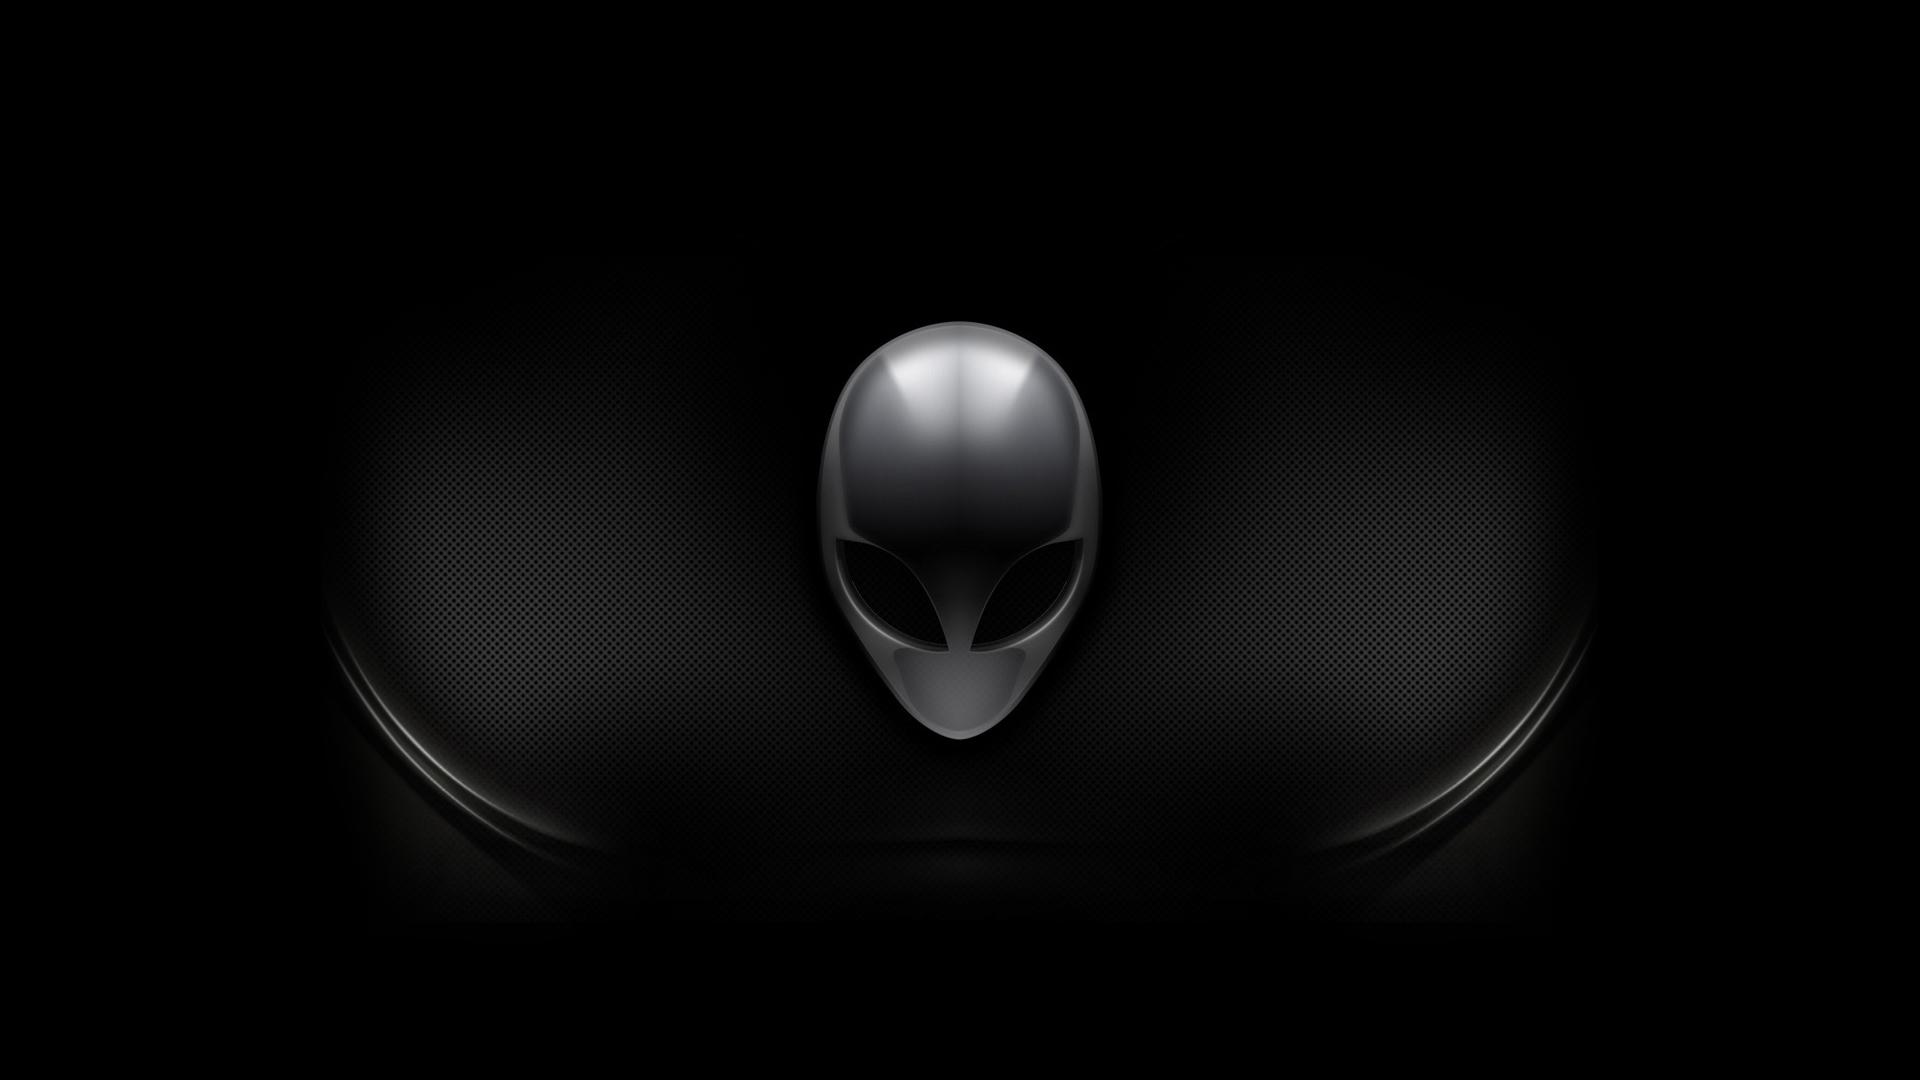 alienware dark logo hd 1920x1080 1080p wallpaper compatible for 1920x1080